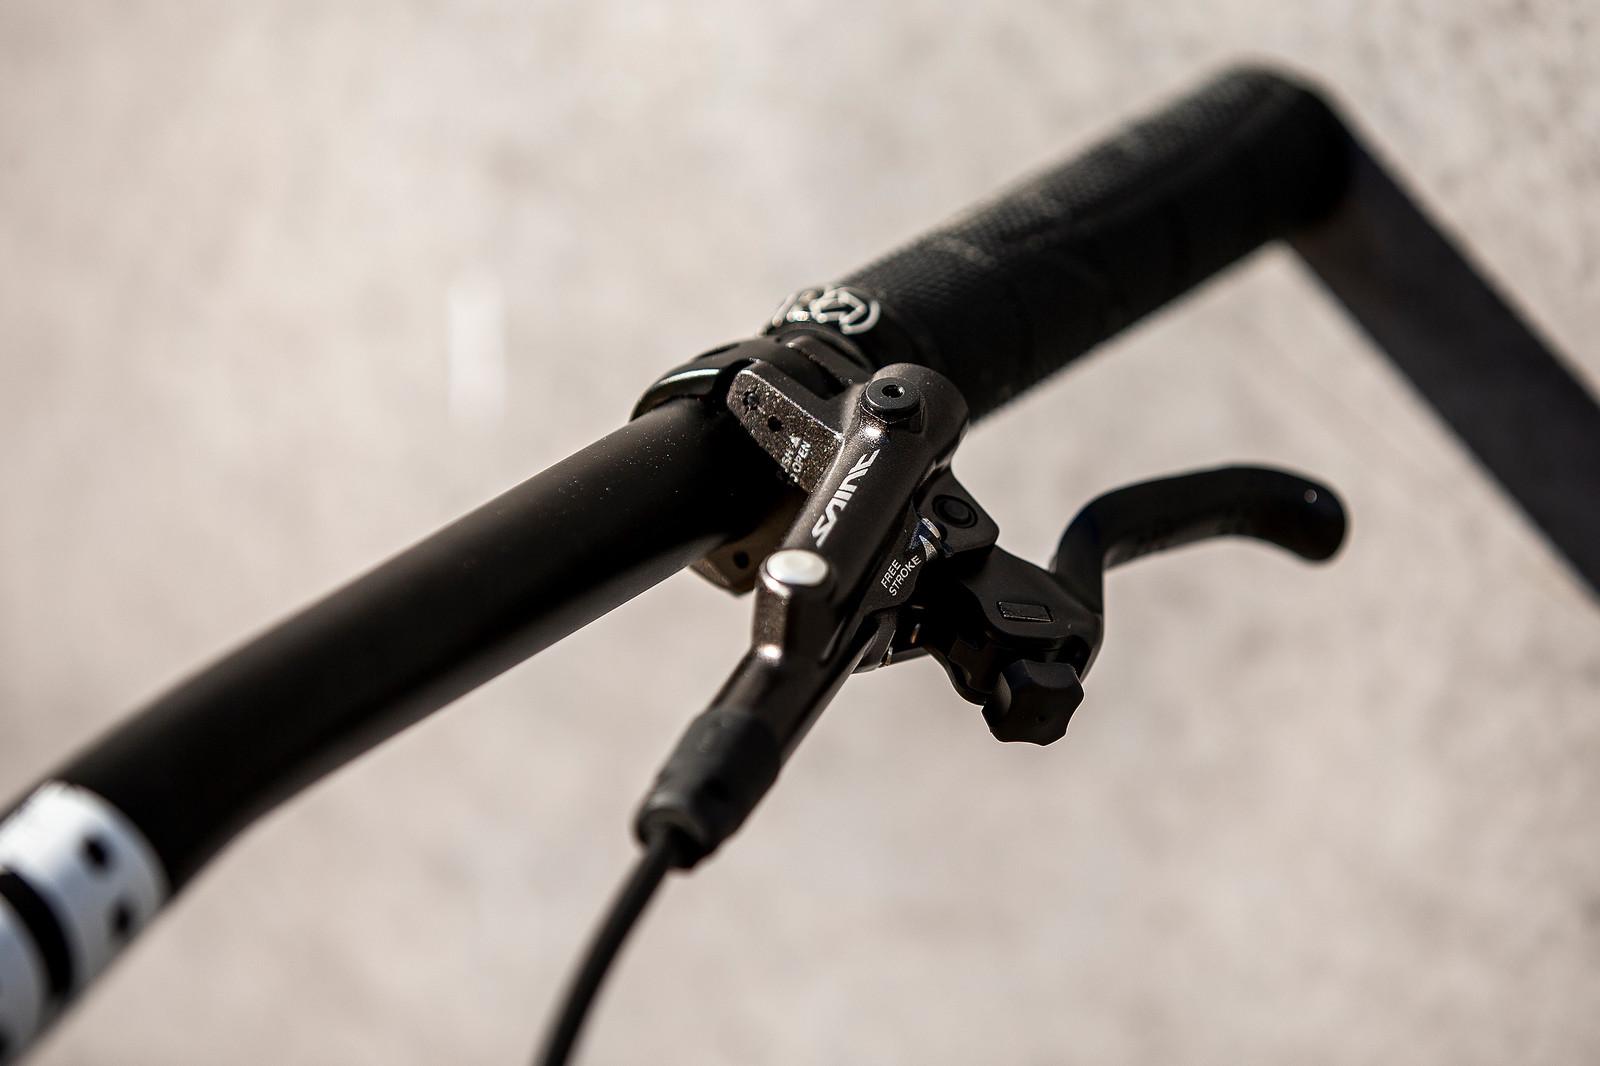 Saint Levers - WORLD CHAMPS BIKE - Alex Marin's Saracen Myst - Mountain Biking Pictures - Vital MTB